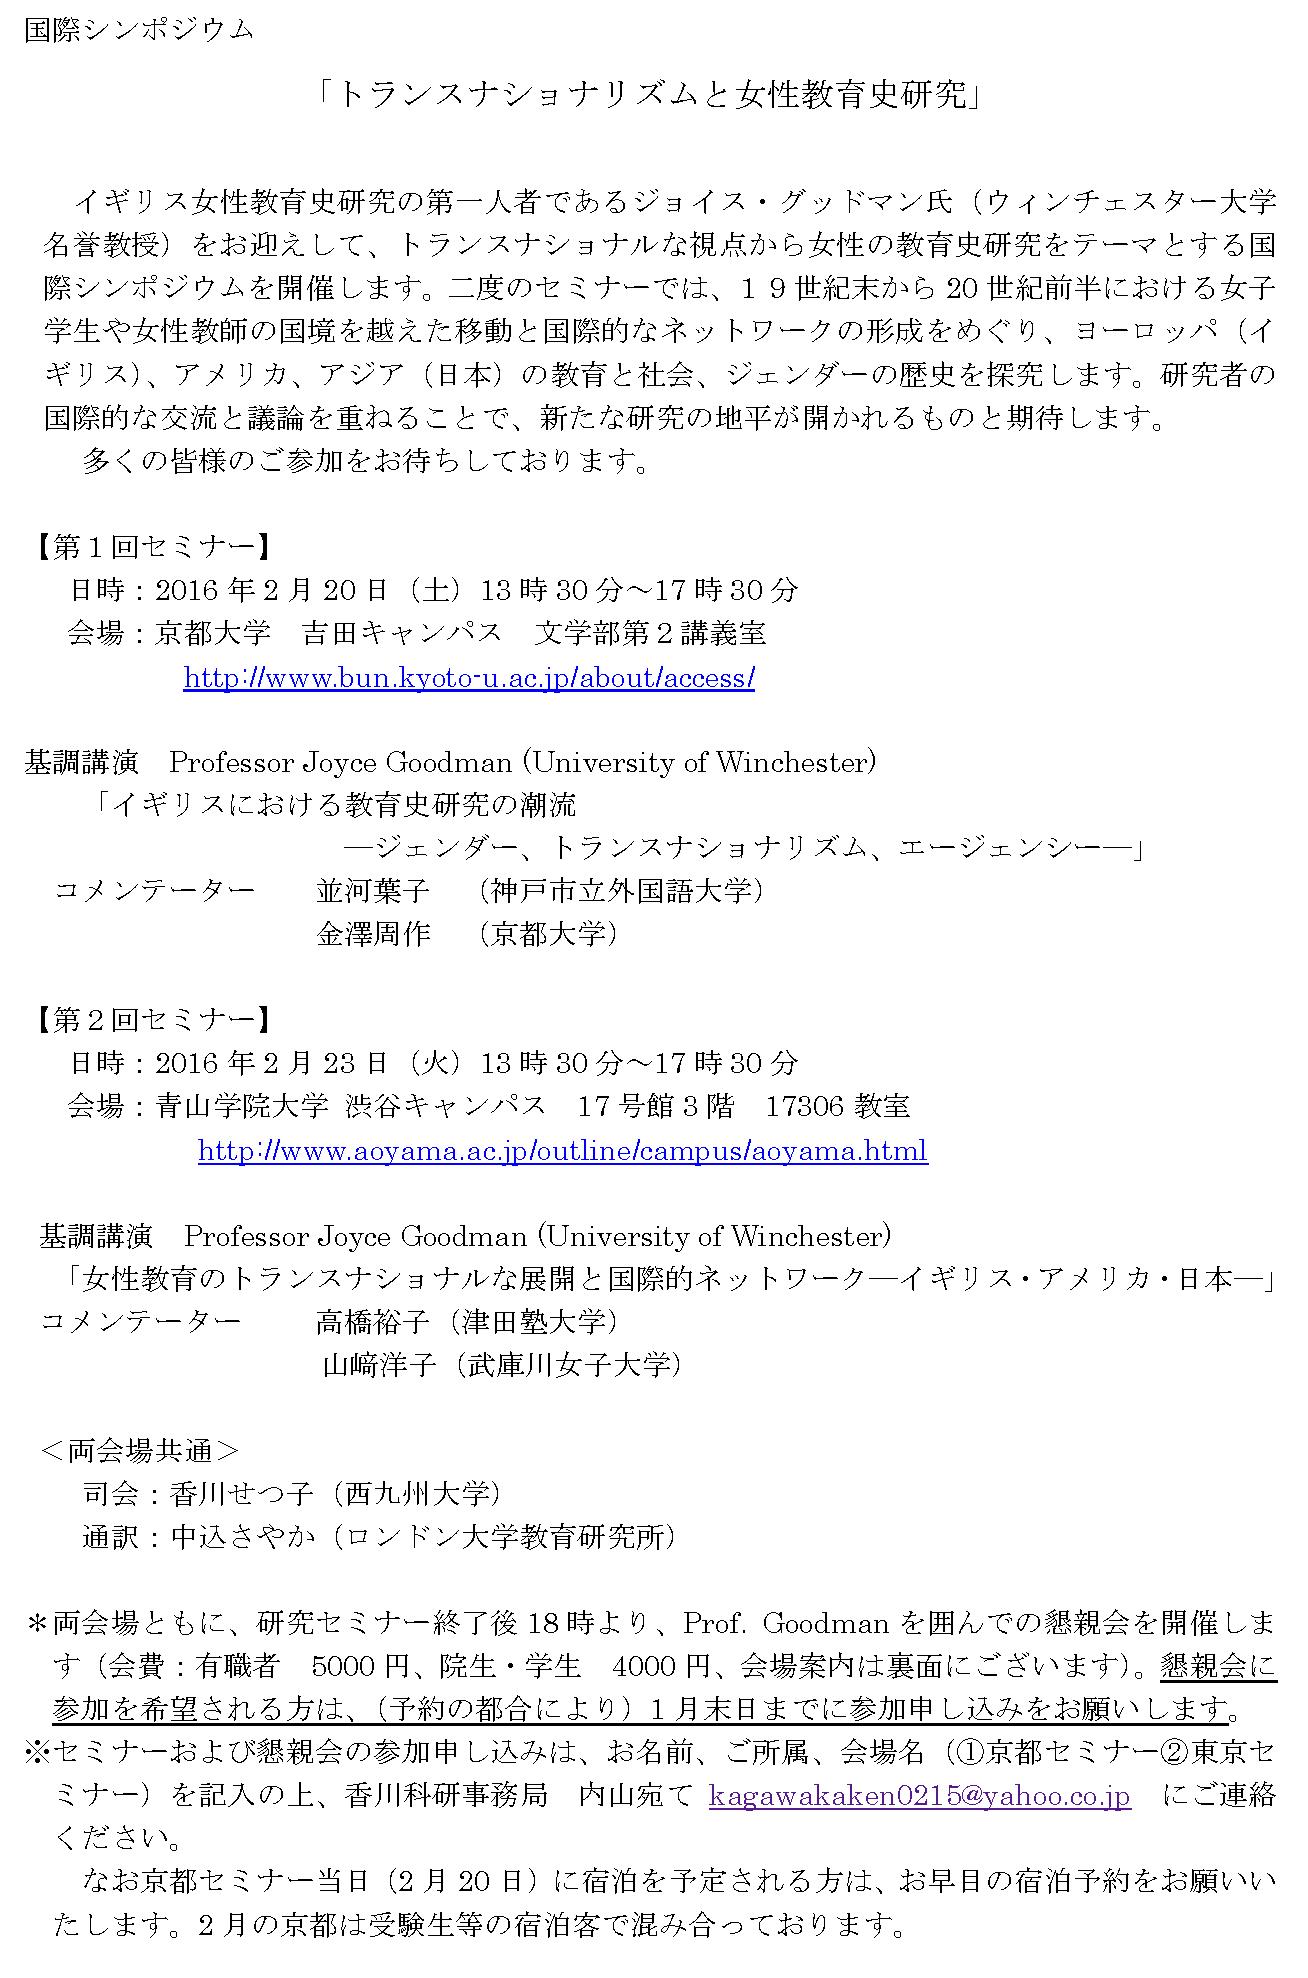 160220_sympo_01